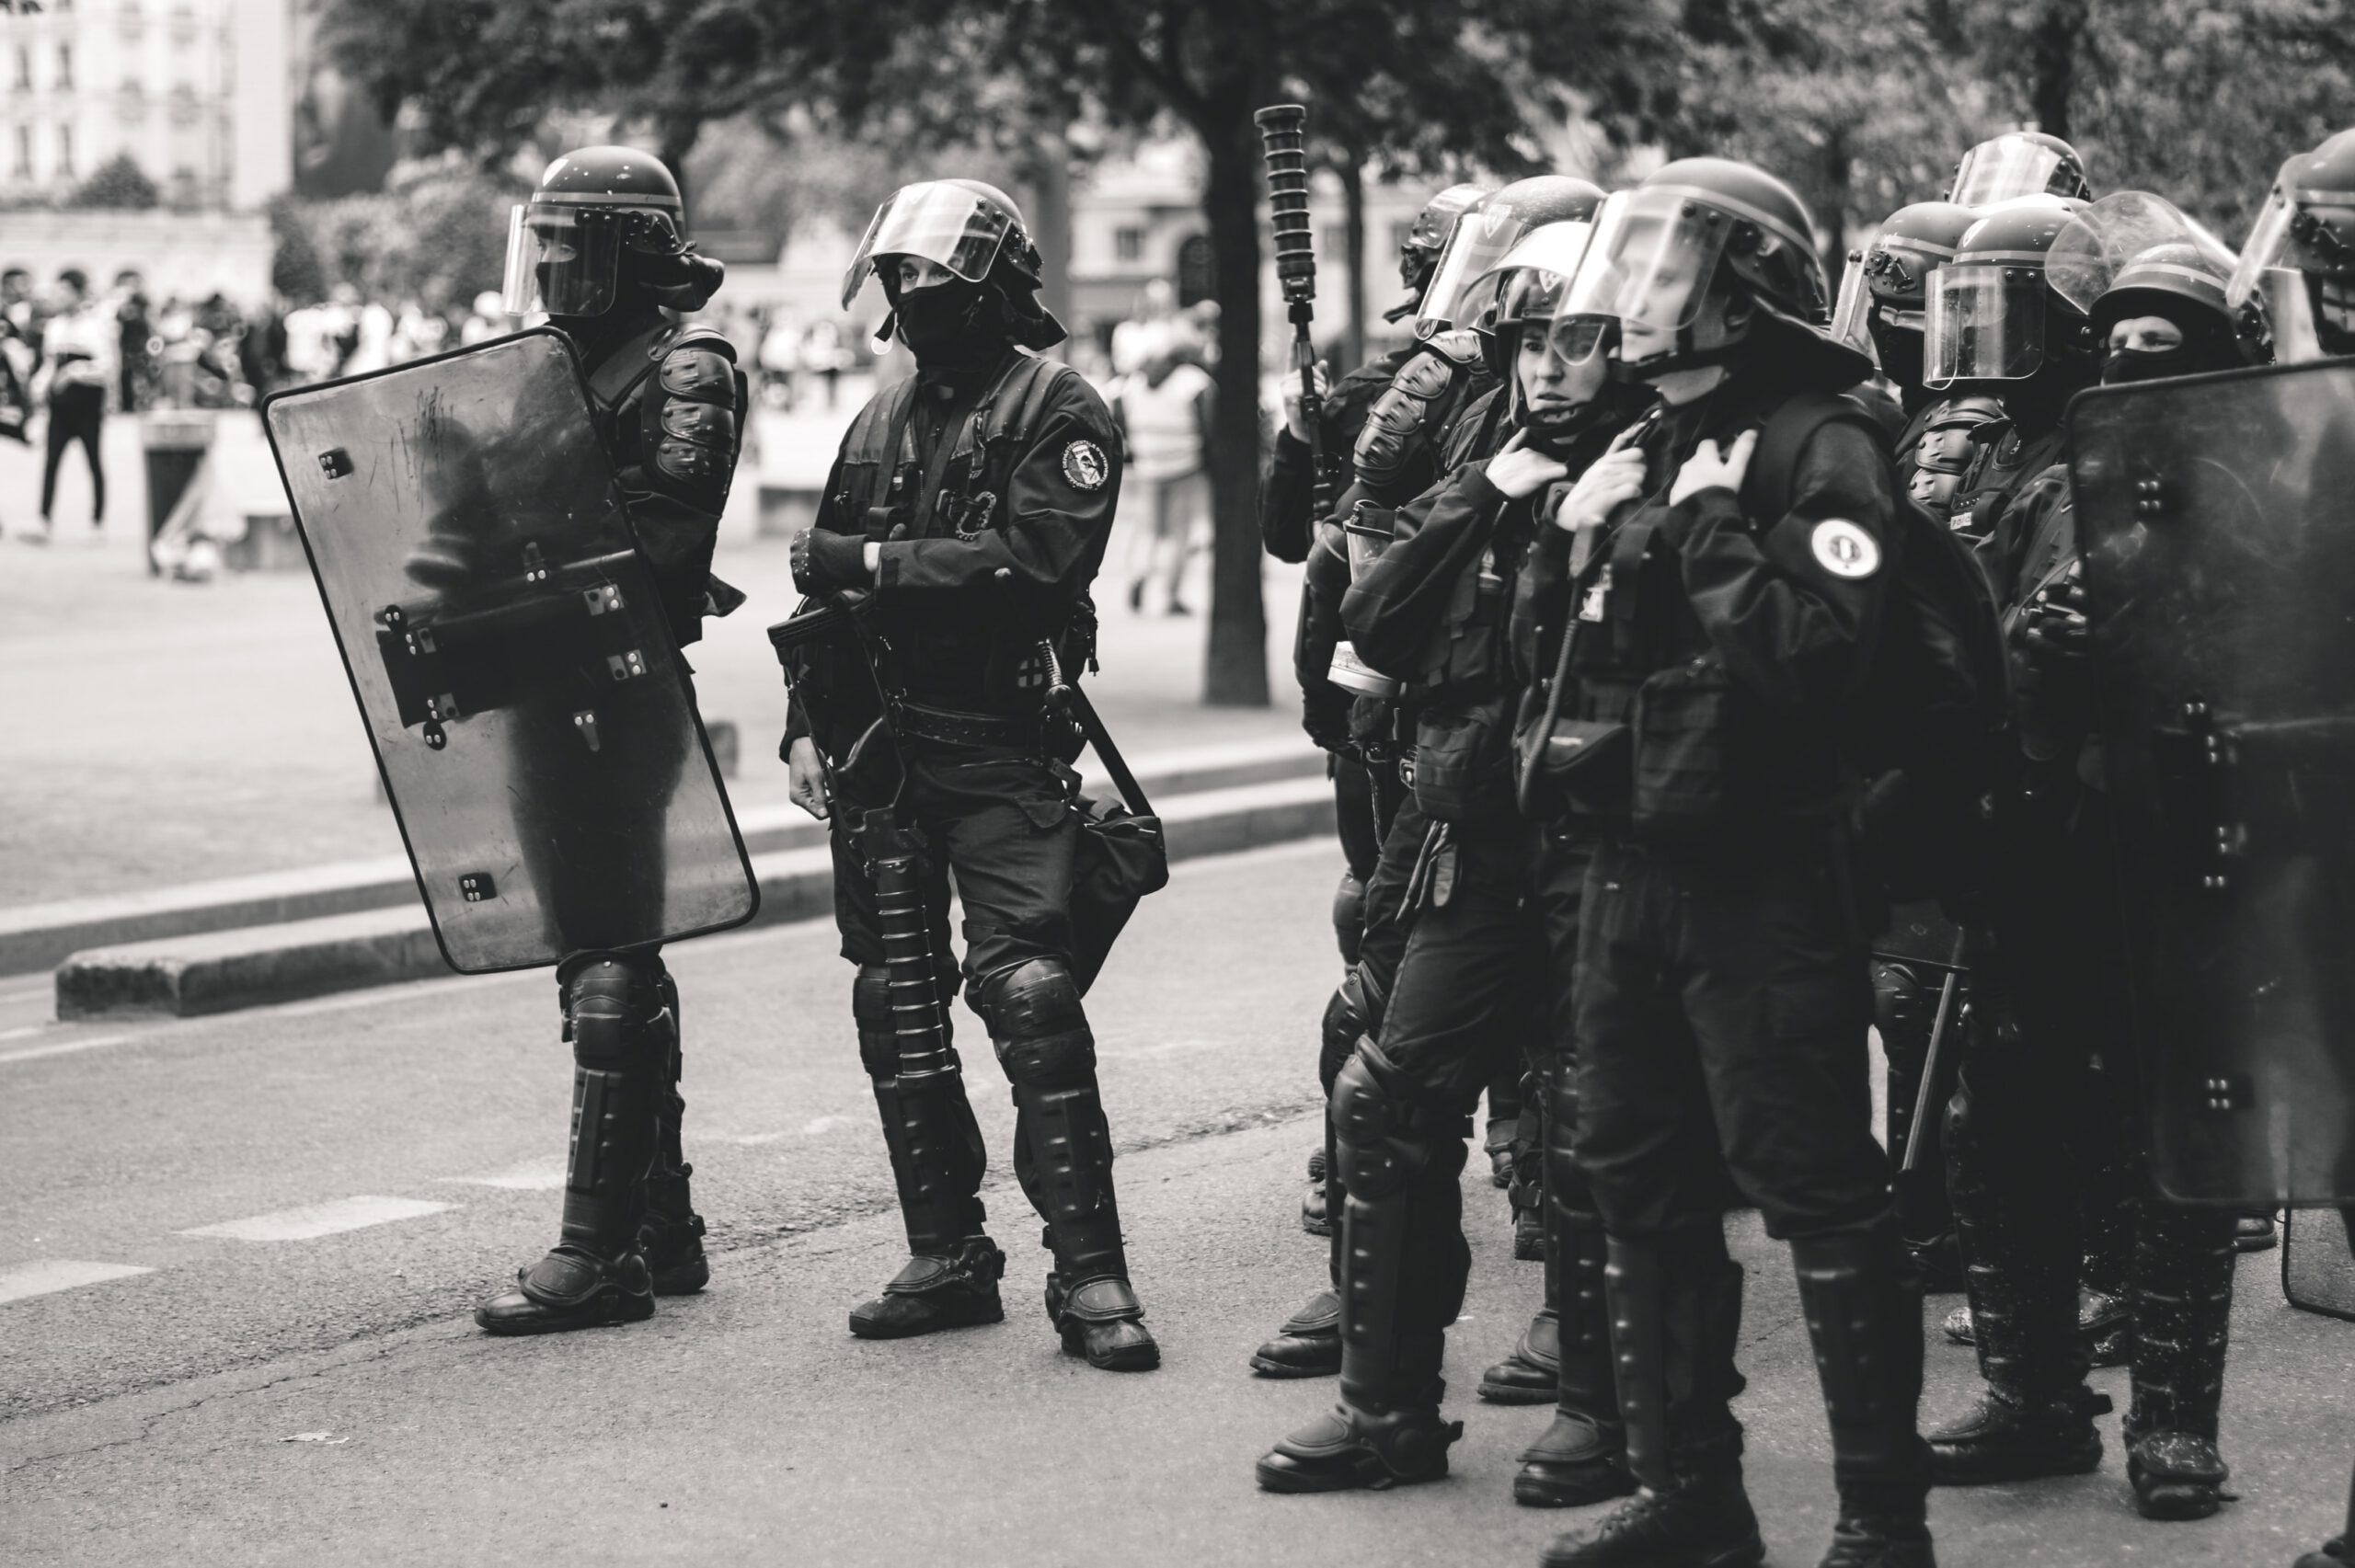 FBI Monitors Social Media, Warns of Armed Protests at ALL 50 US Capitols